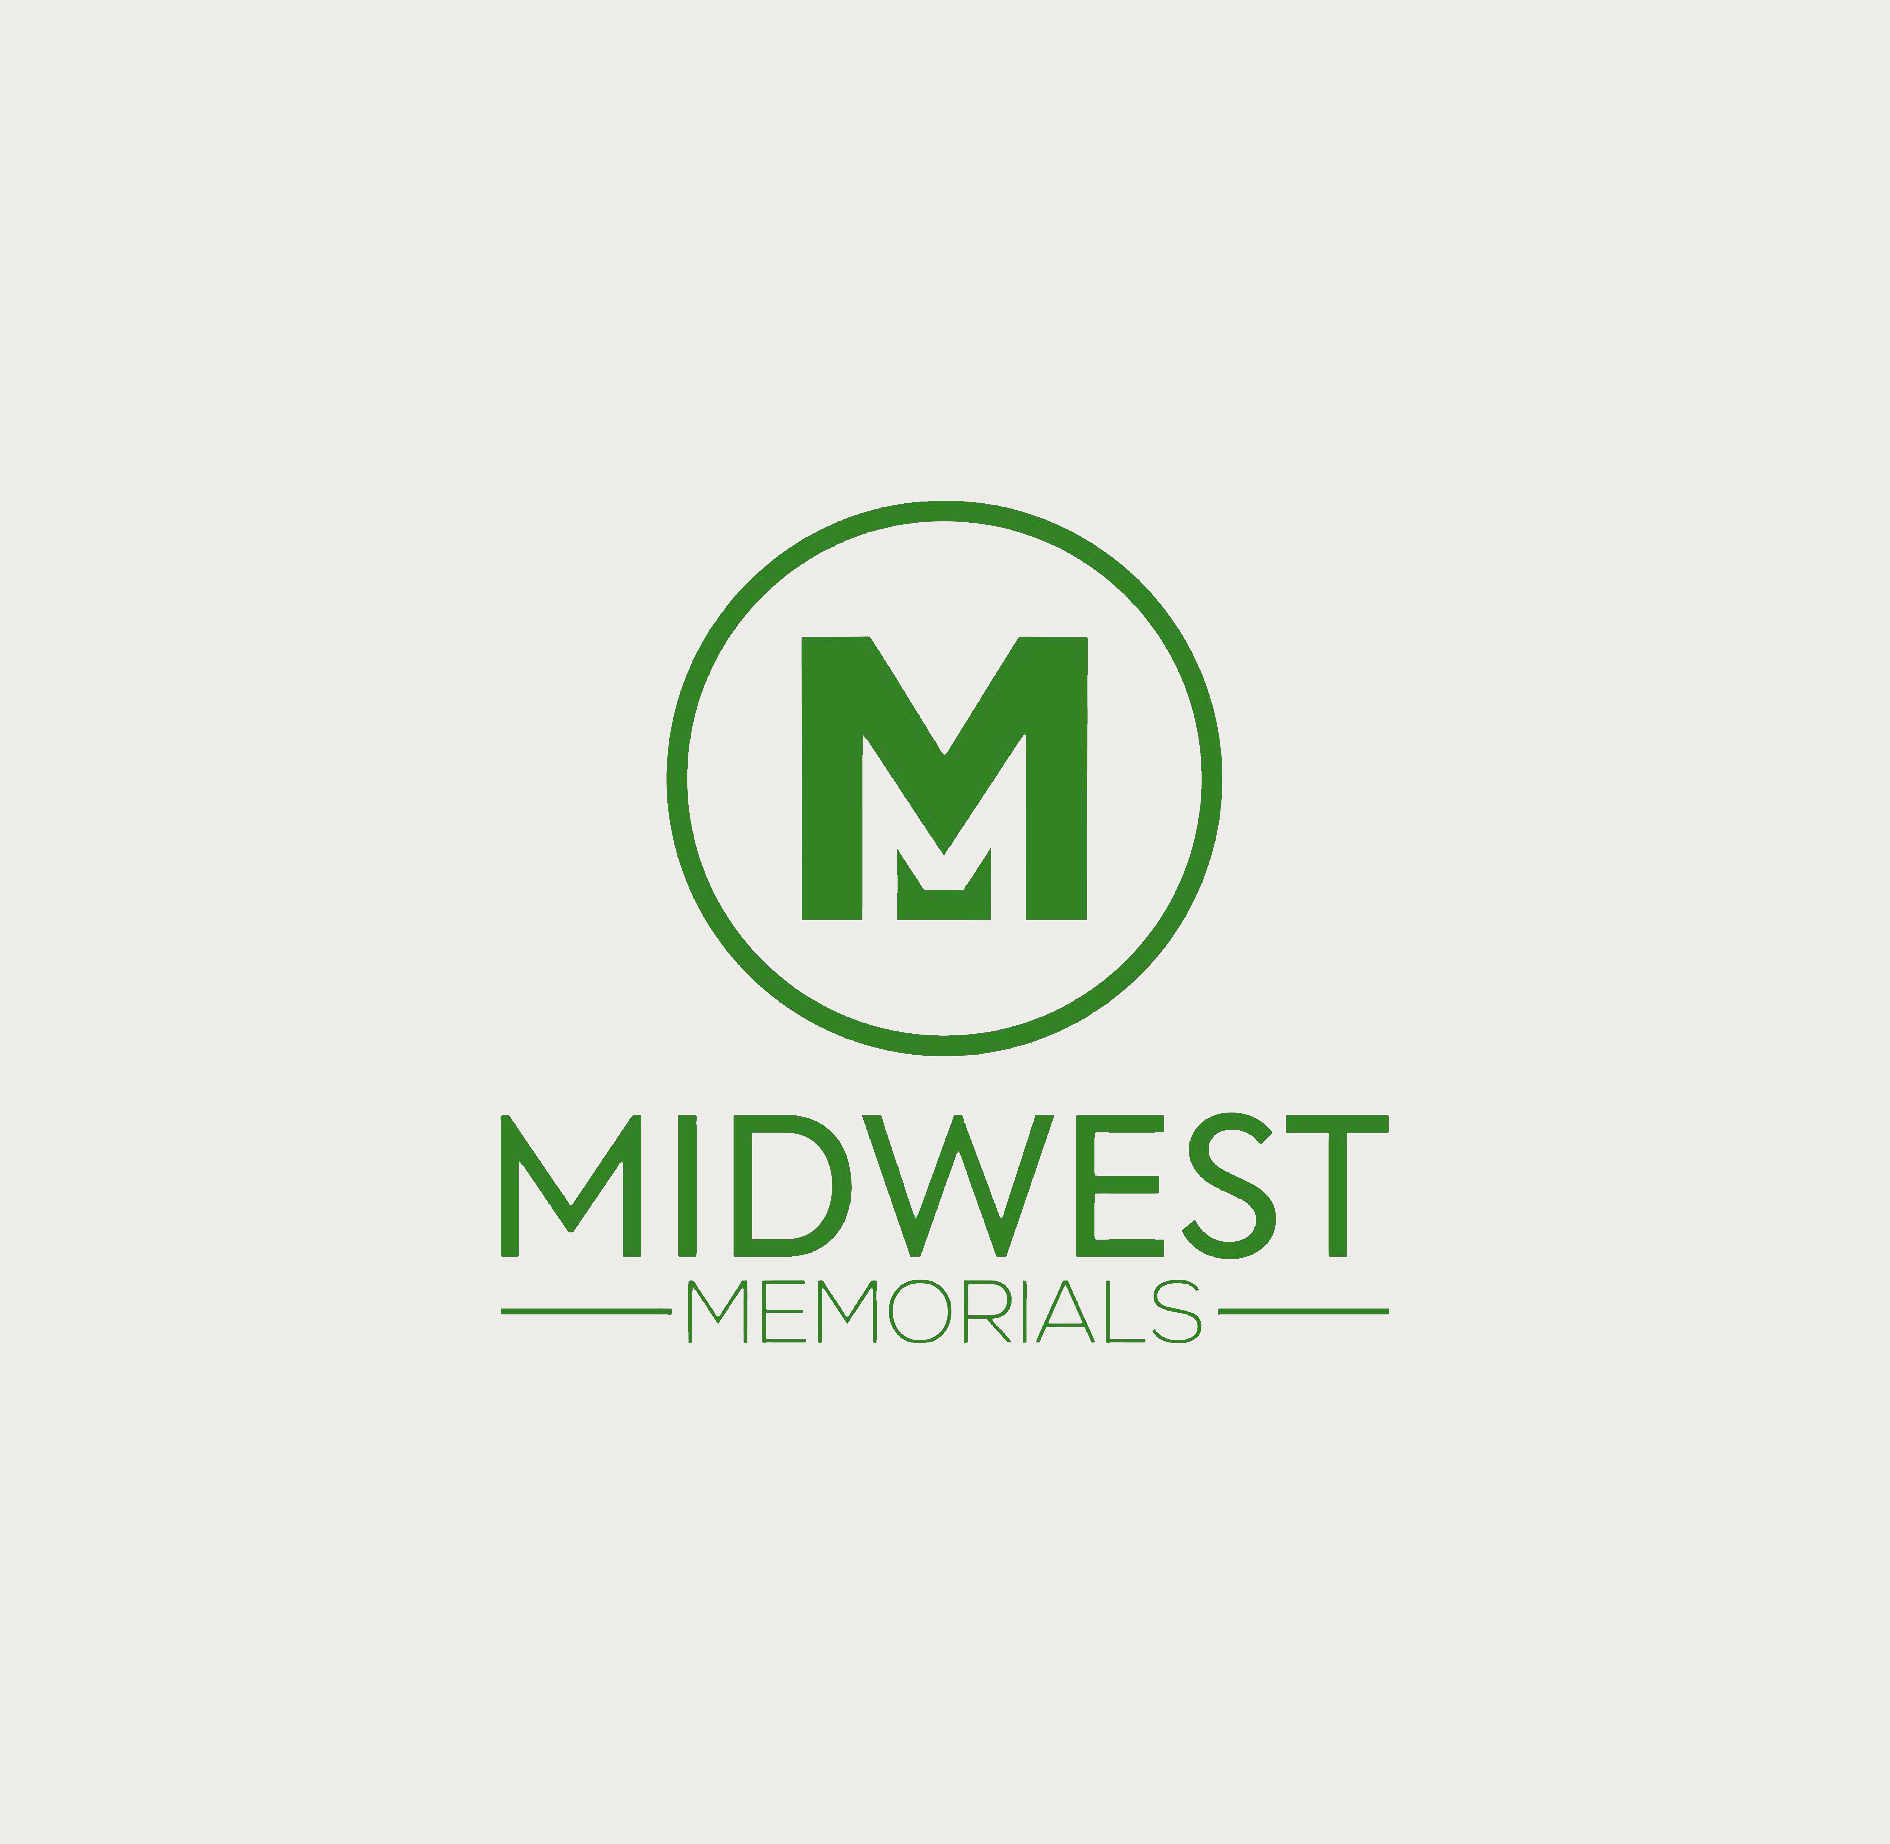 Midwest Memorials